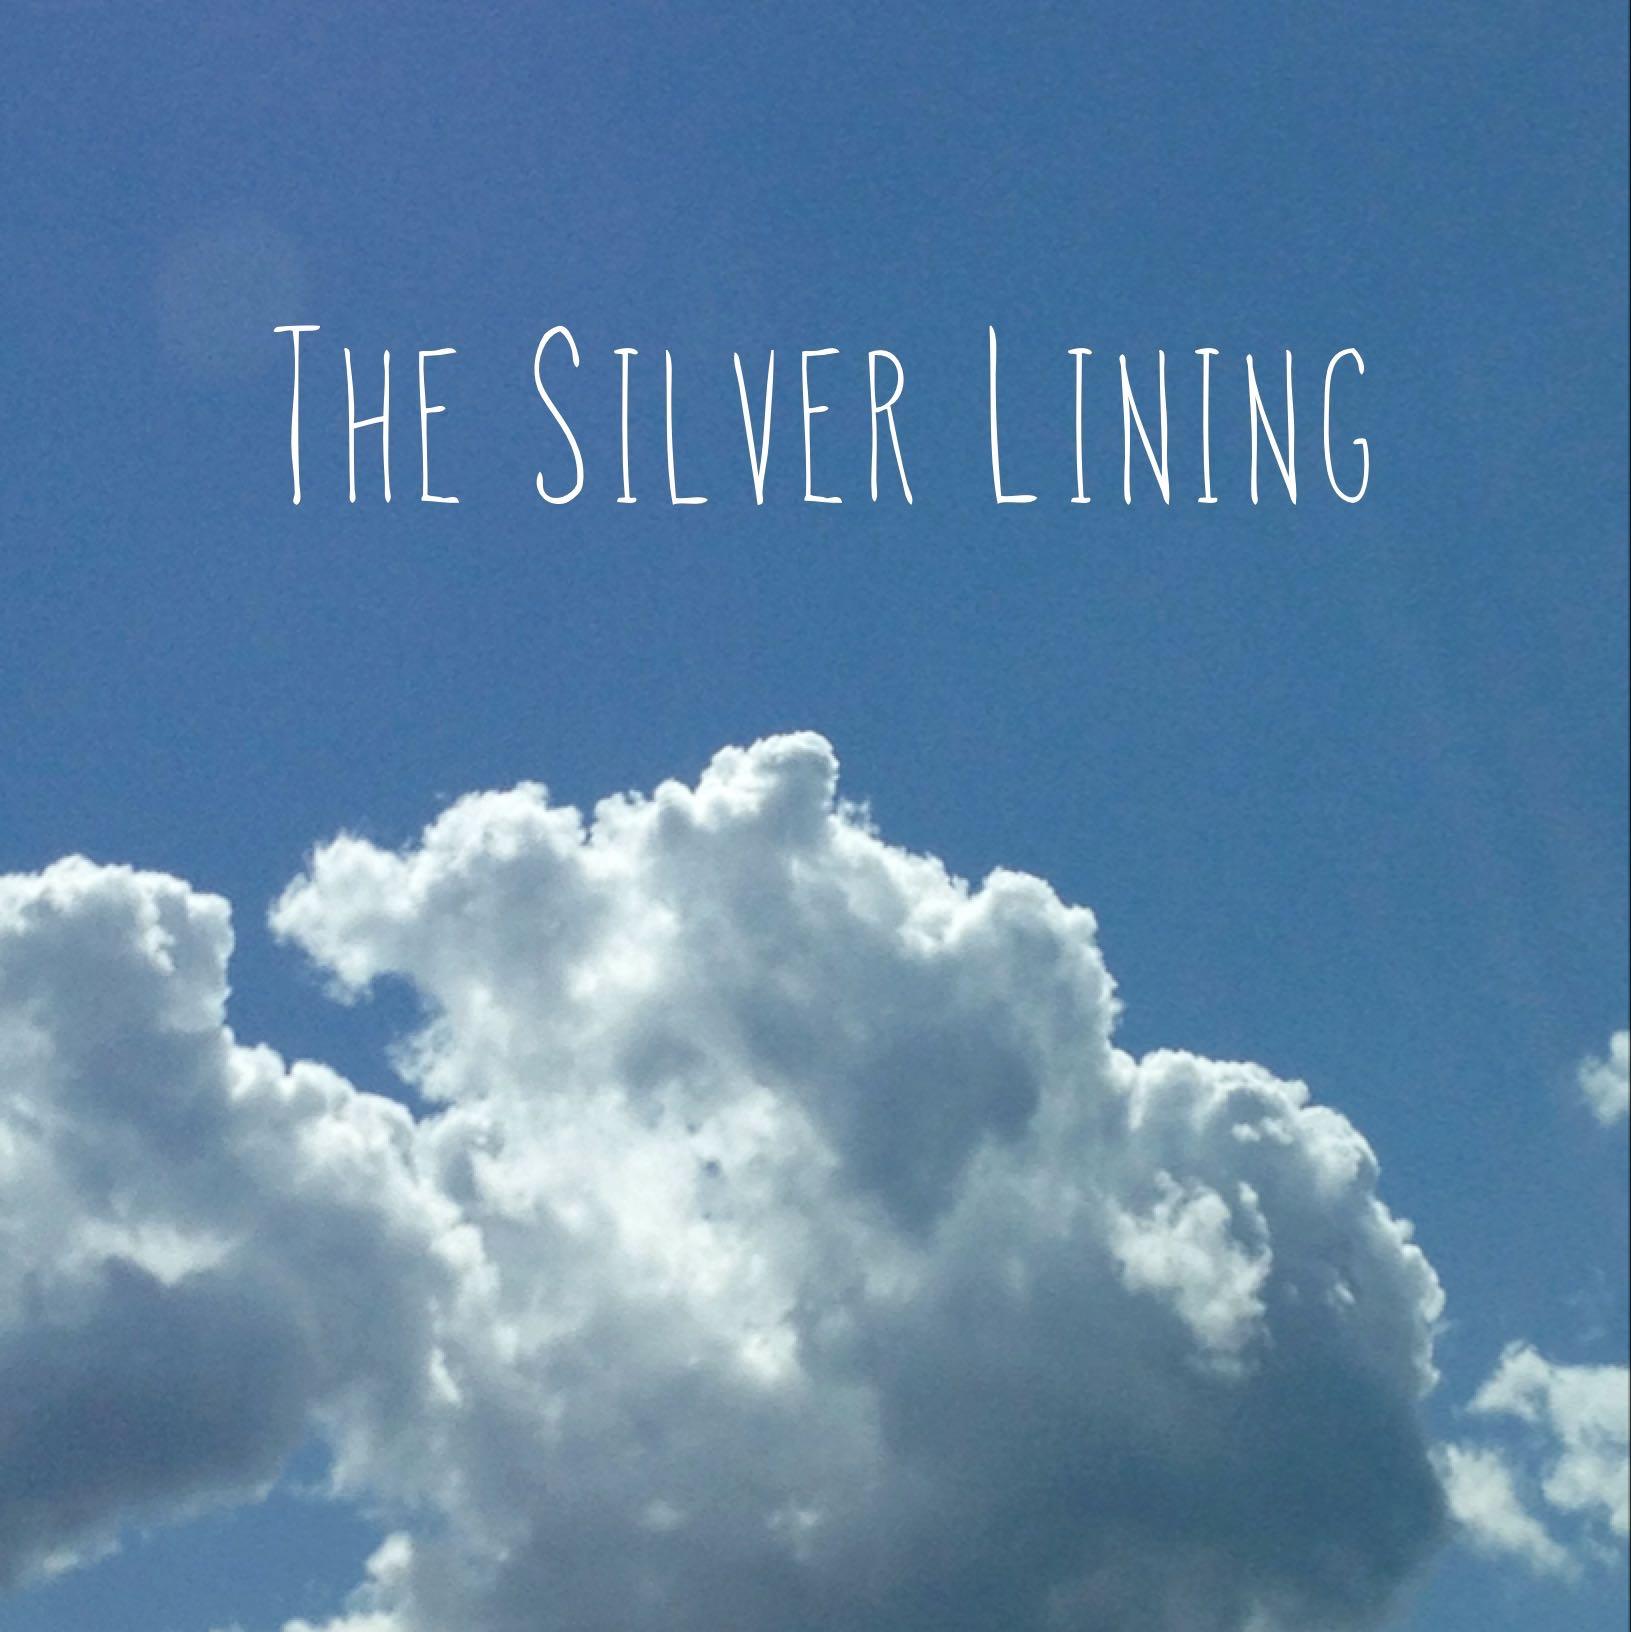 thesliverlining